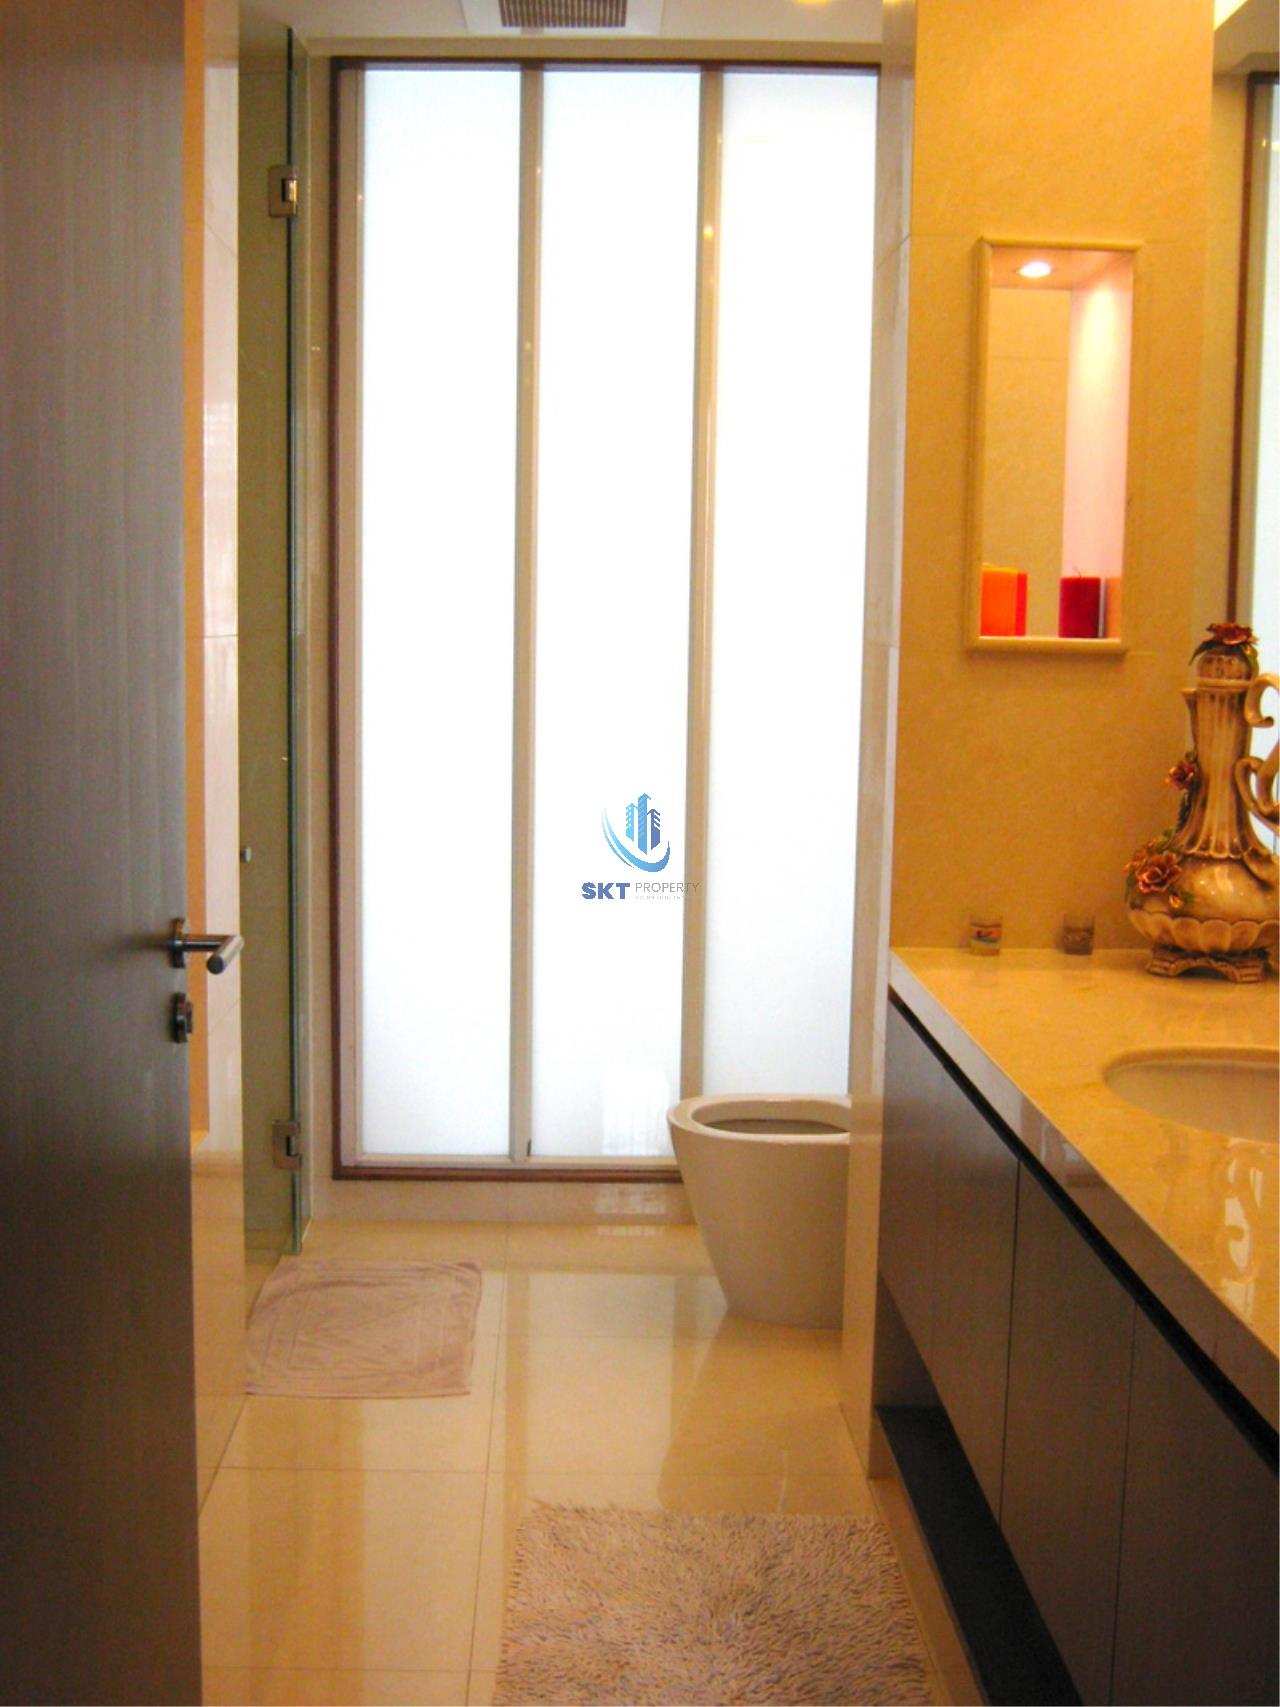 Sukritta Property Agency's D'Raj Residences - Bts Asoke 12